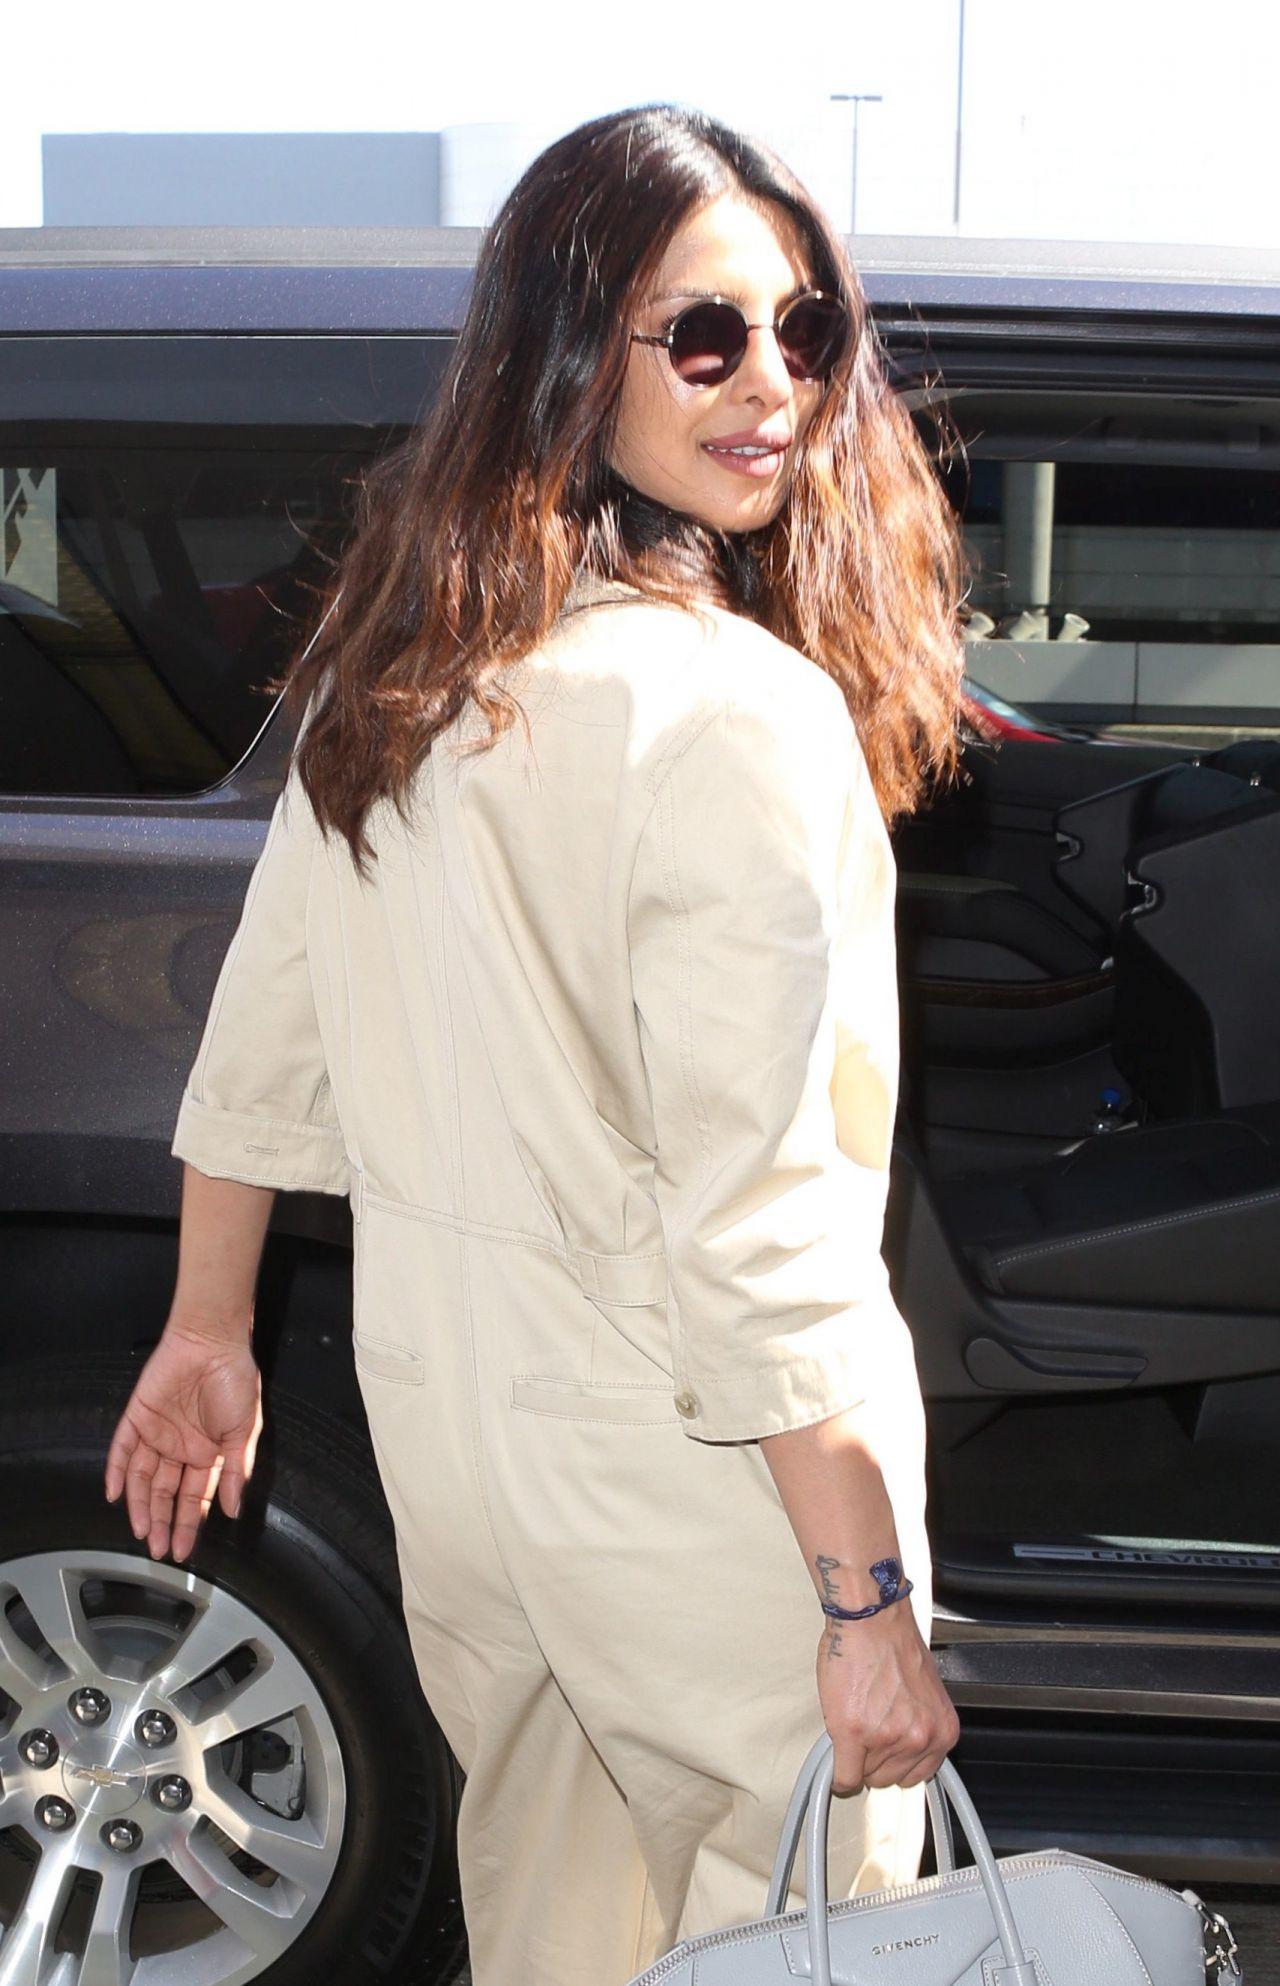 Priyanka Chopra Arriving At Lax Airport In Los Angeles